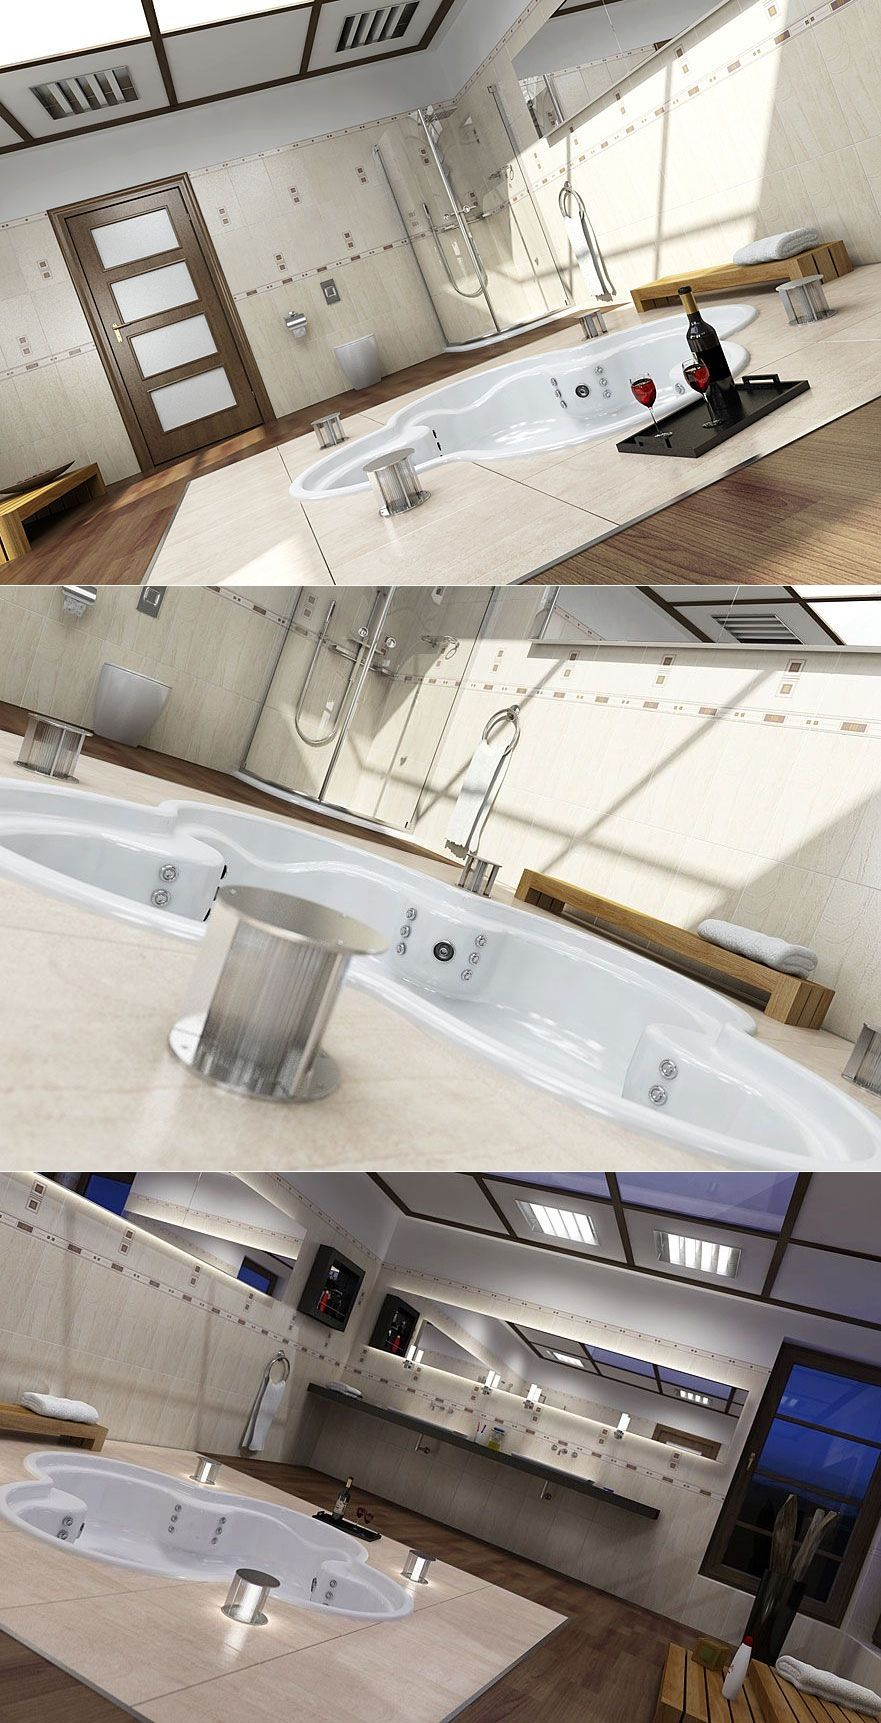 A Fresh Take on Bath Tubs | Pinterest | Bath tubs, Tubs and Spa